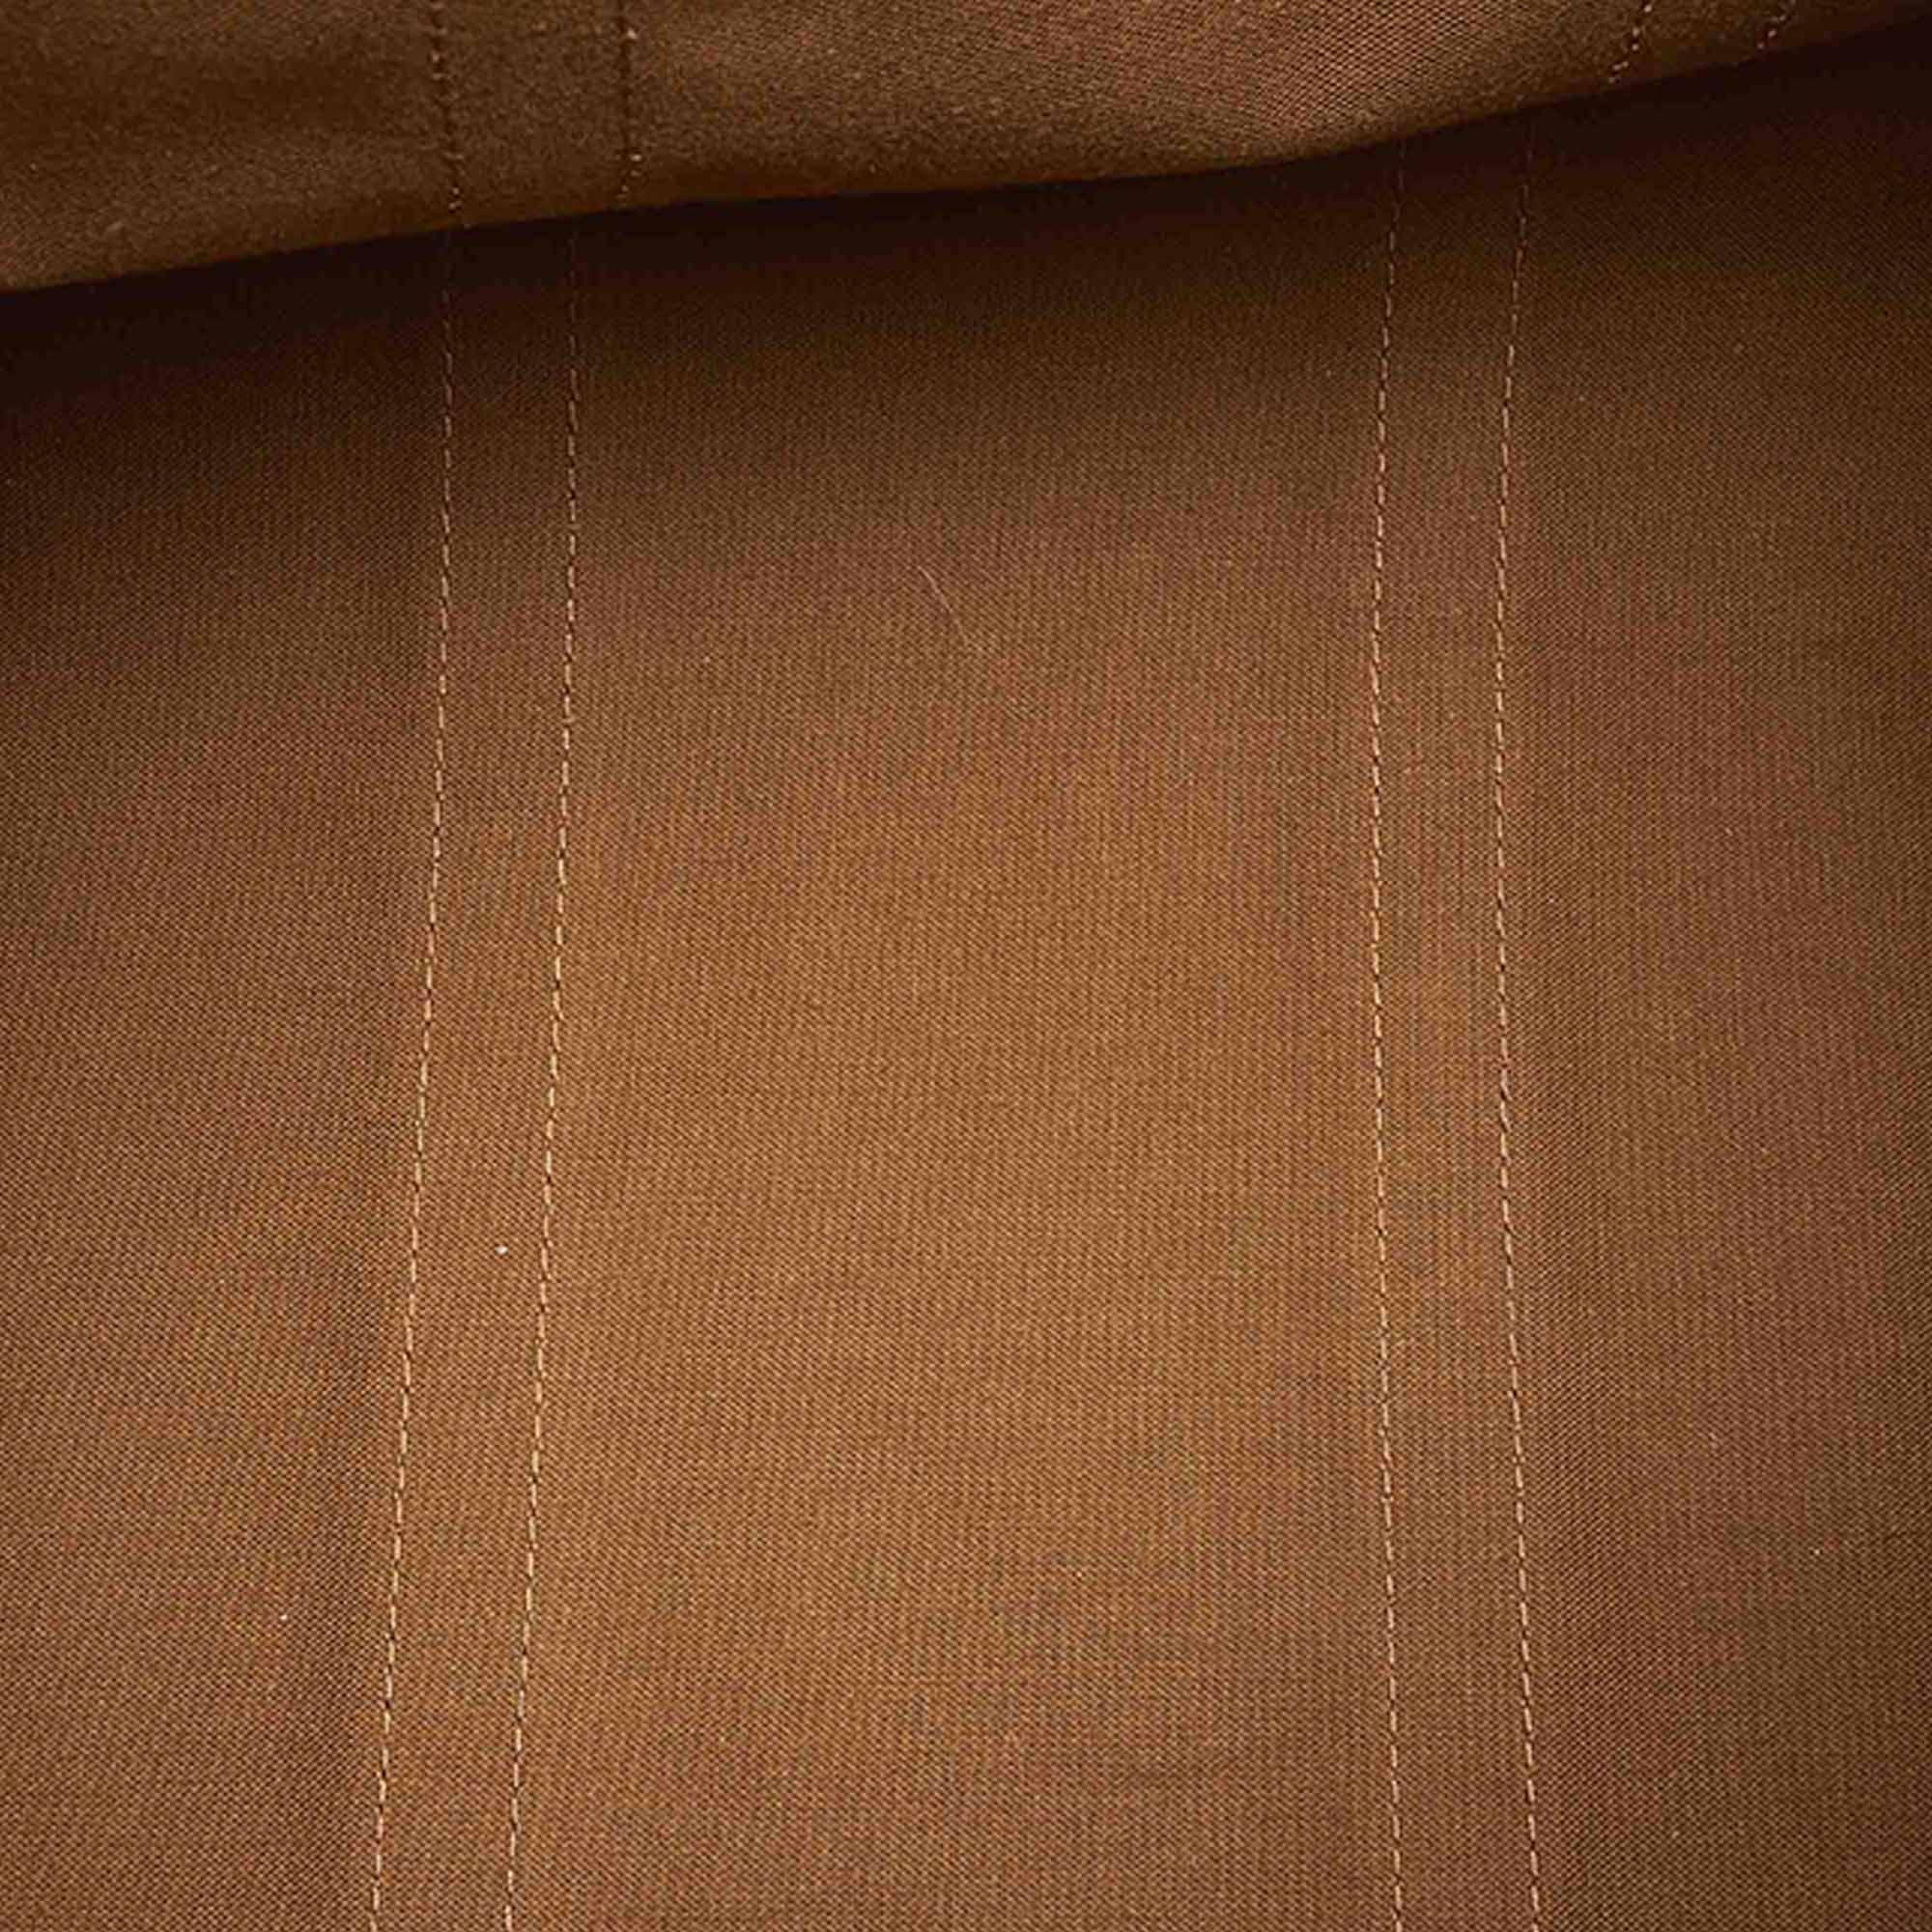 Vintage Louis Vuitton Monogram Keepall 50 Brown